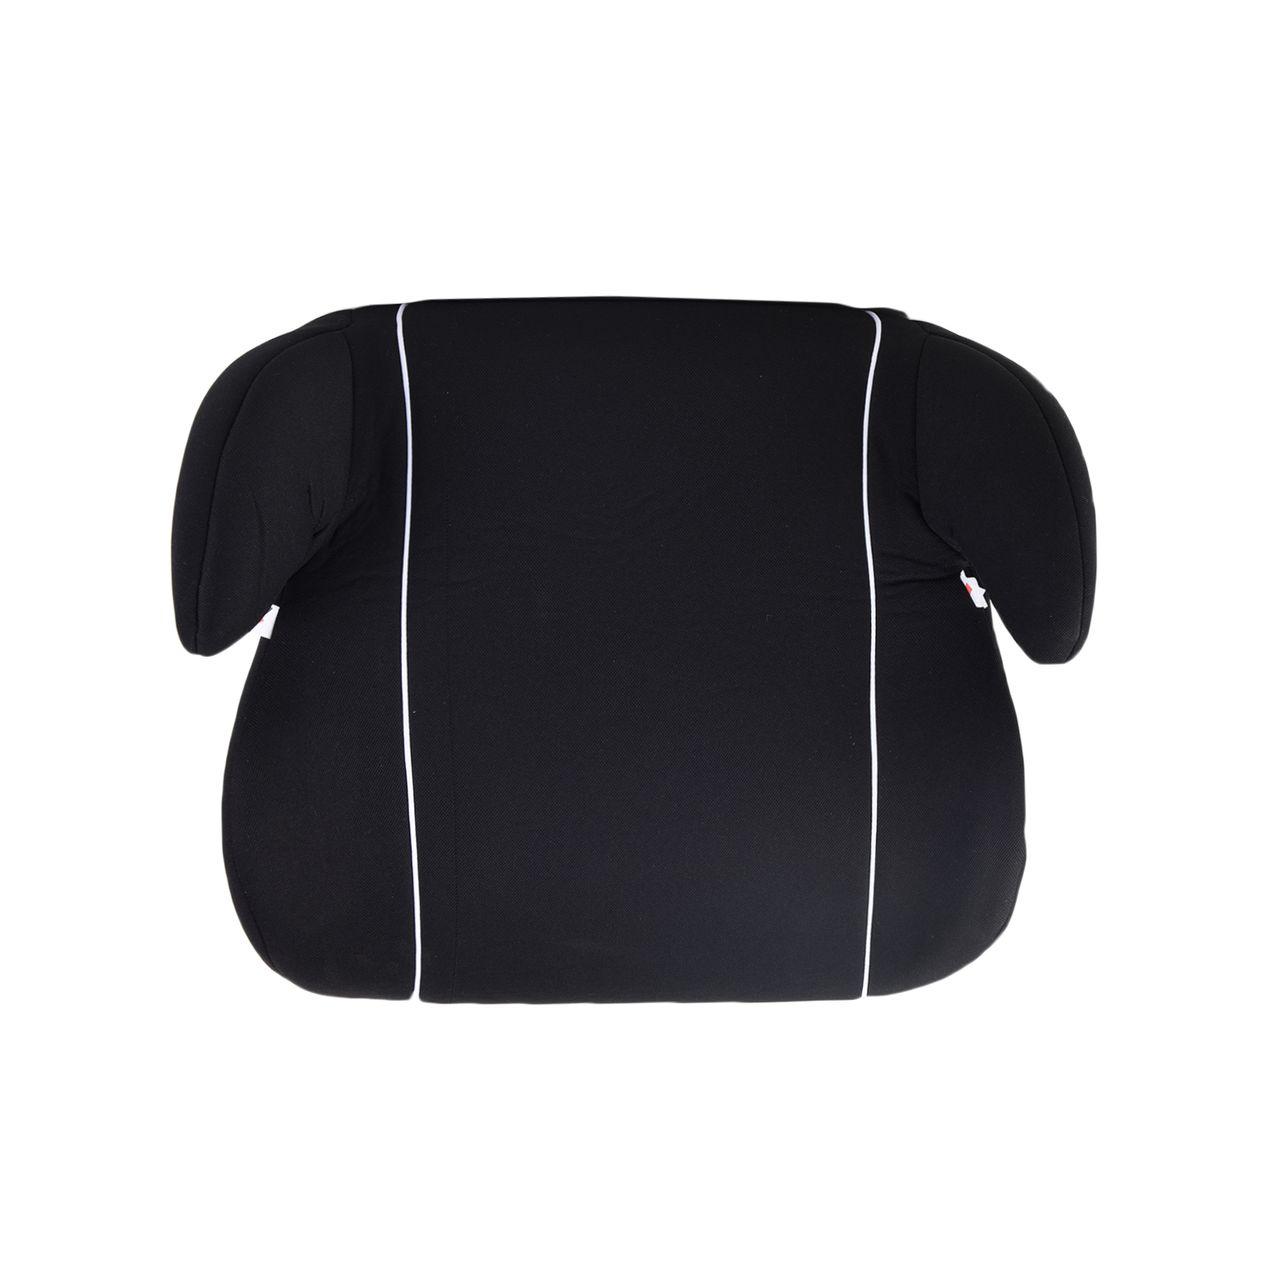 autositz kinder sitzerh hung kissen autokindersitz kindersitz 15 36 kg ebay. Black Bedroom Furniture Sets. Home Design Ideas